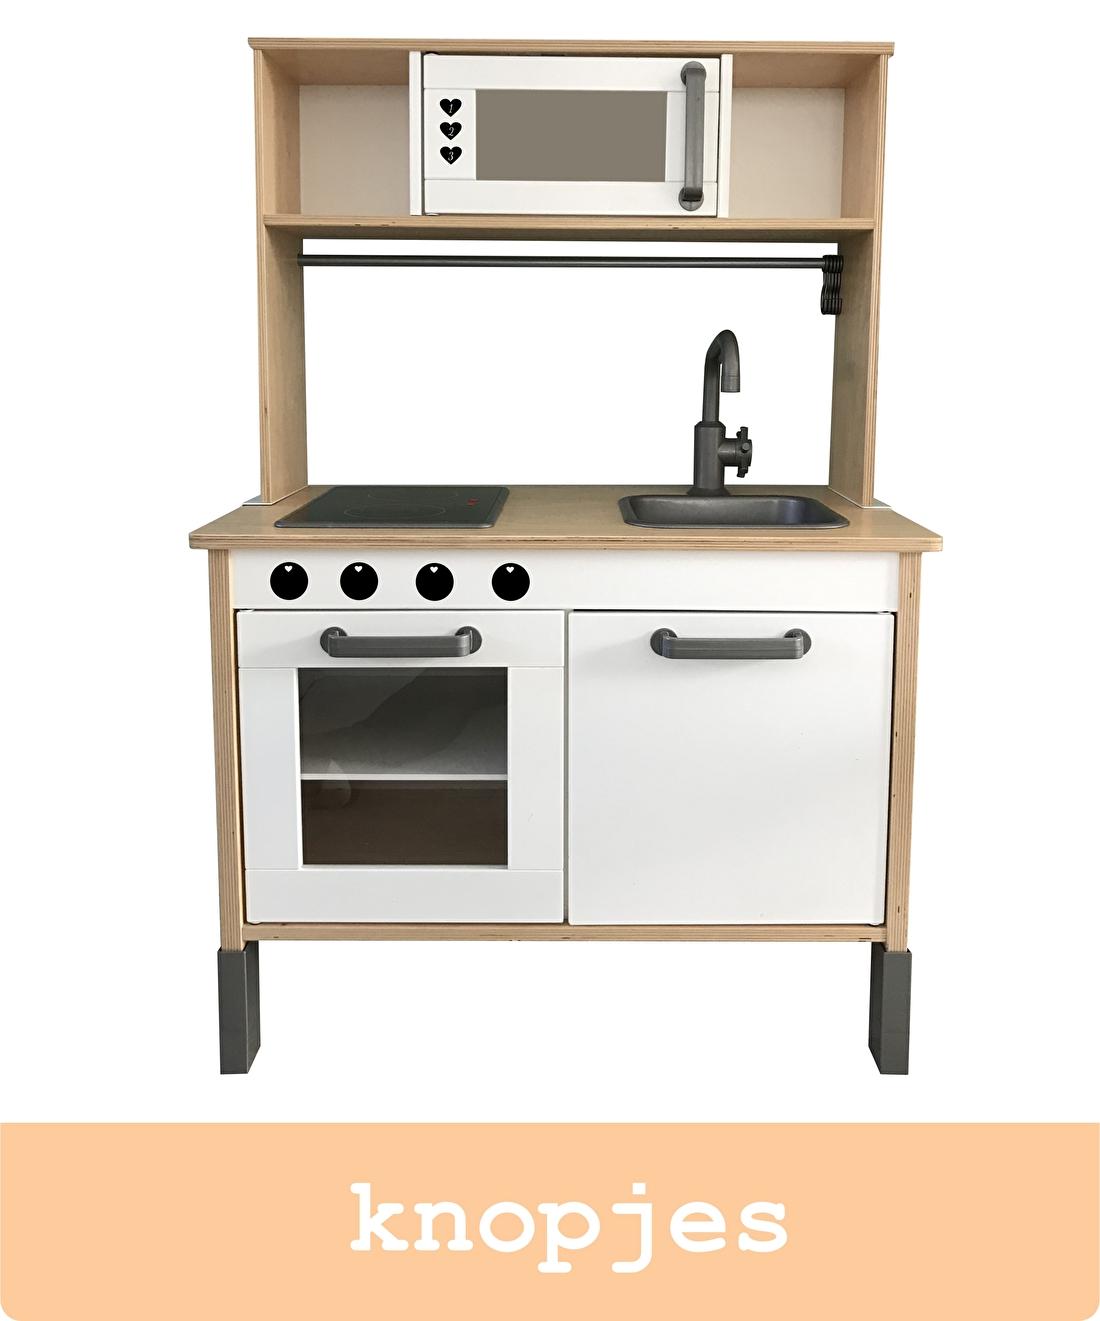 stickers ikea keukentje